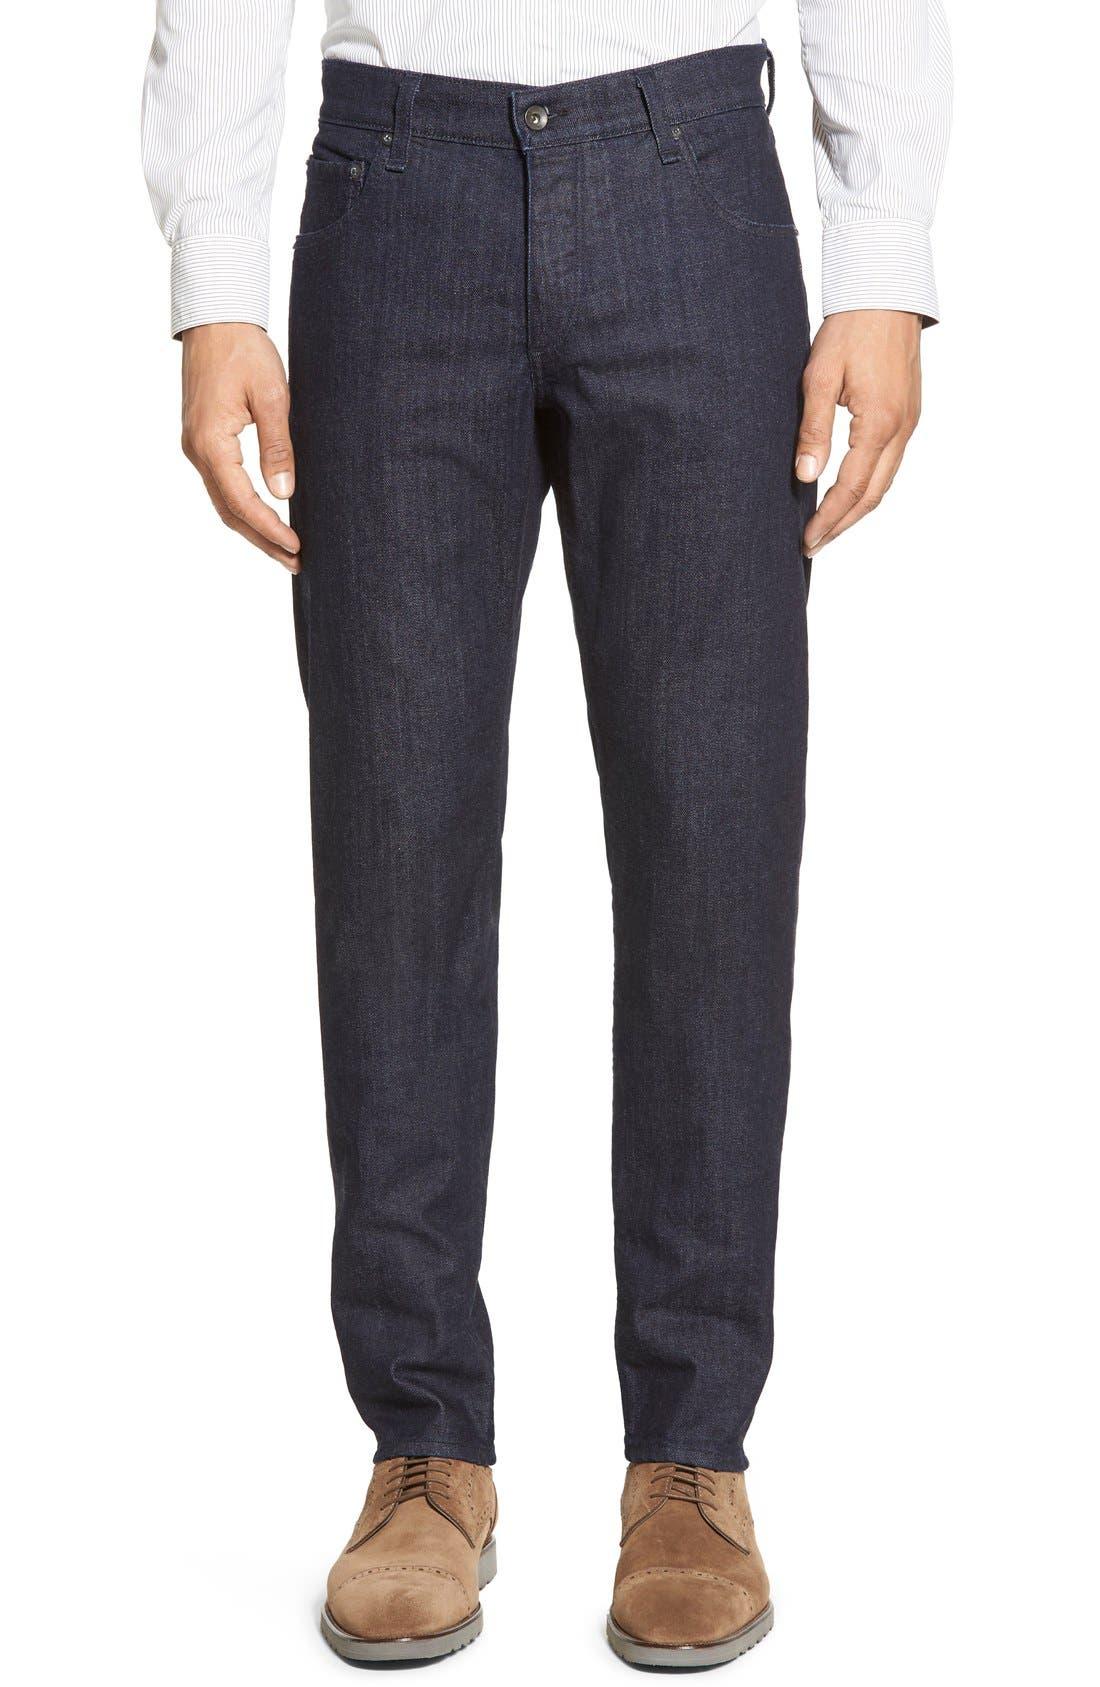 RAG & BONE Standard Issue Fit 2 Slim Fit Jeans, Main, color, TONAL RINSE